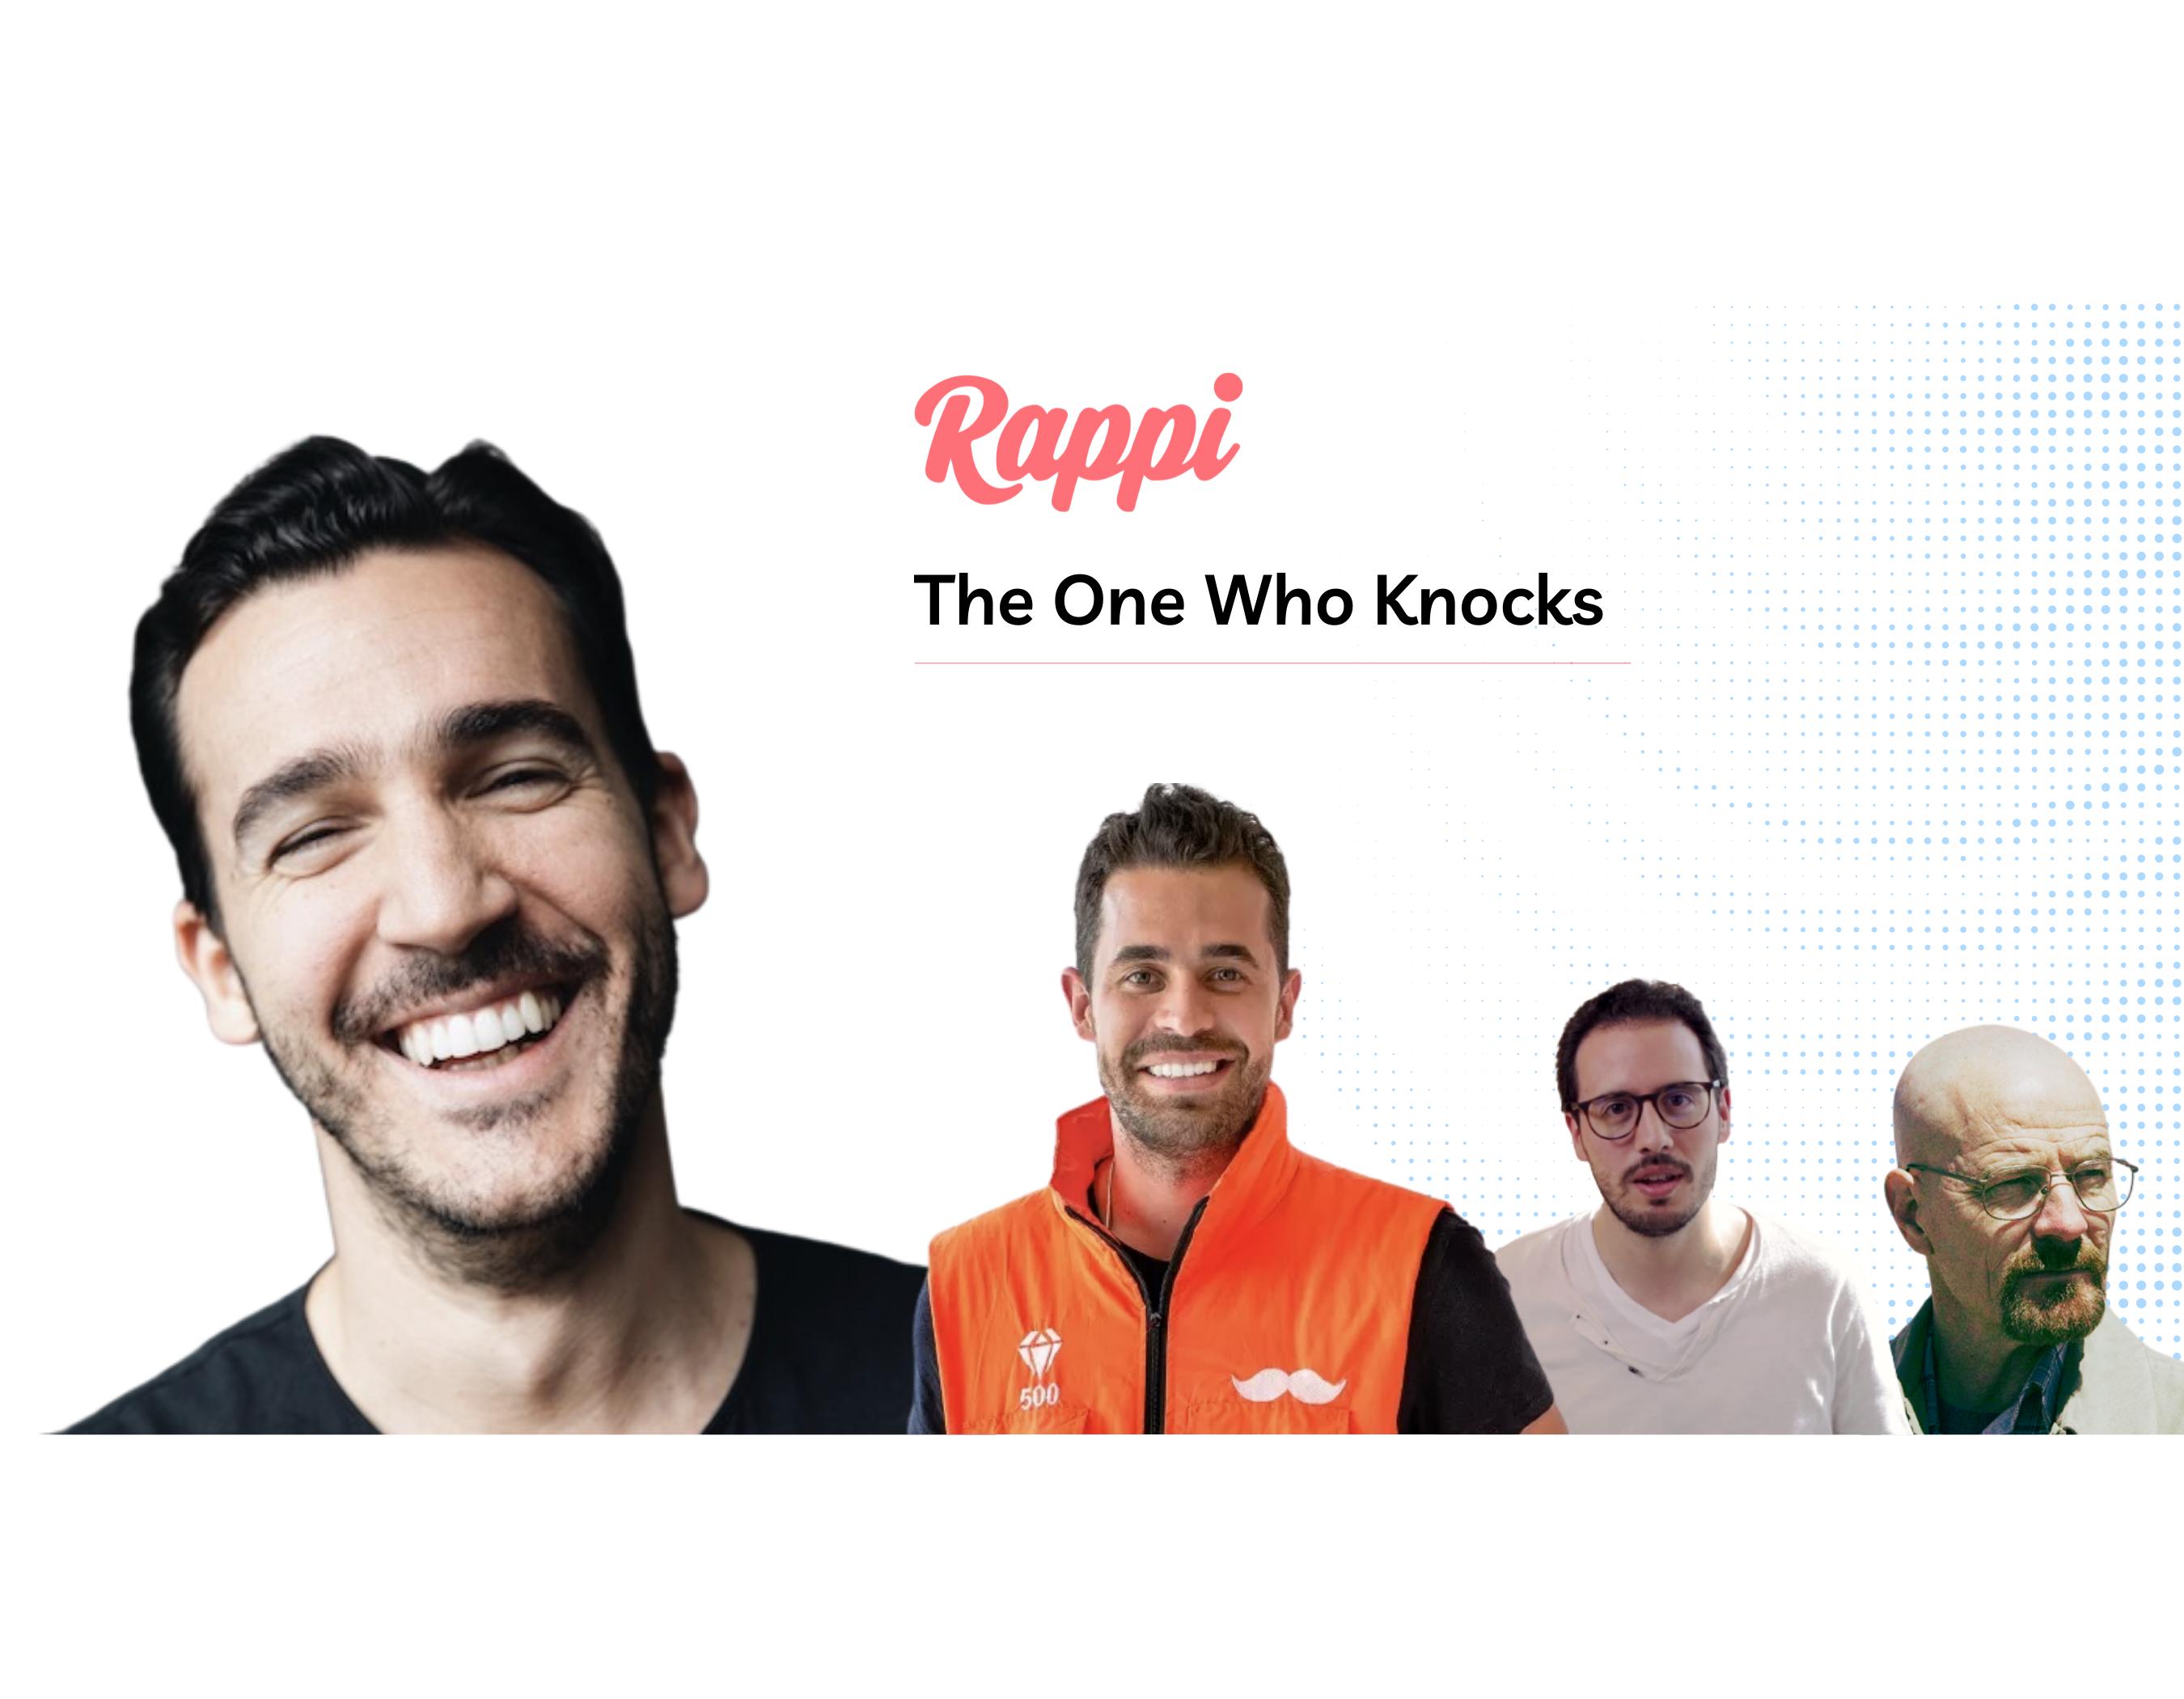 Rappi: The One Who Knocks